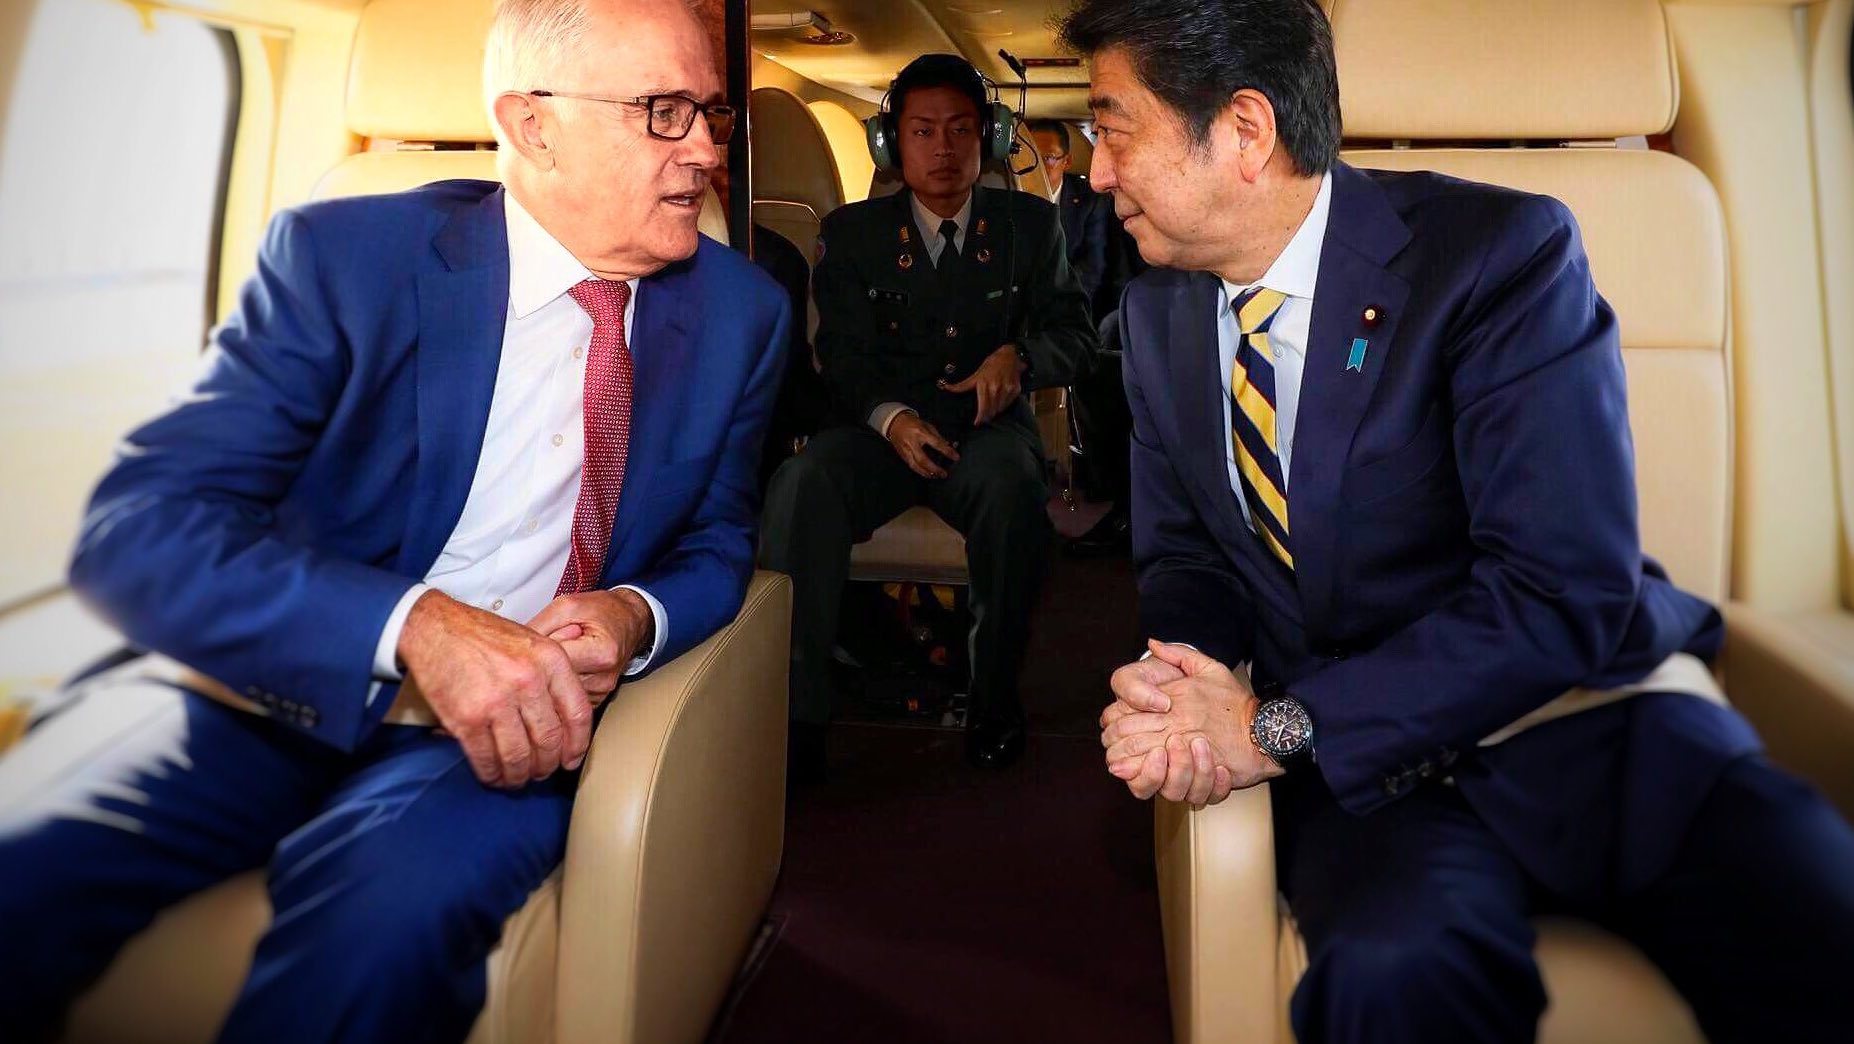 Malcolm Turnbull last week with his Japanese counterpart Shinzo Abe (Photo: Shinzo Abe/Twitter)